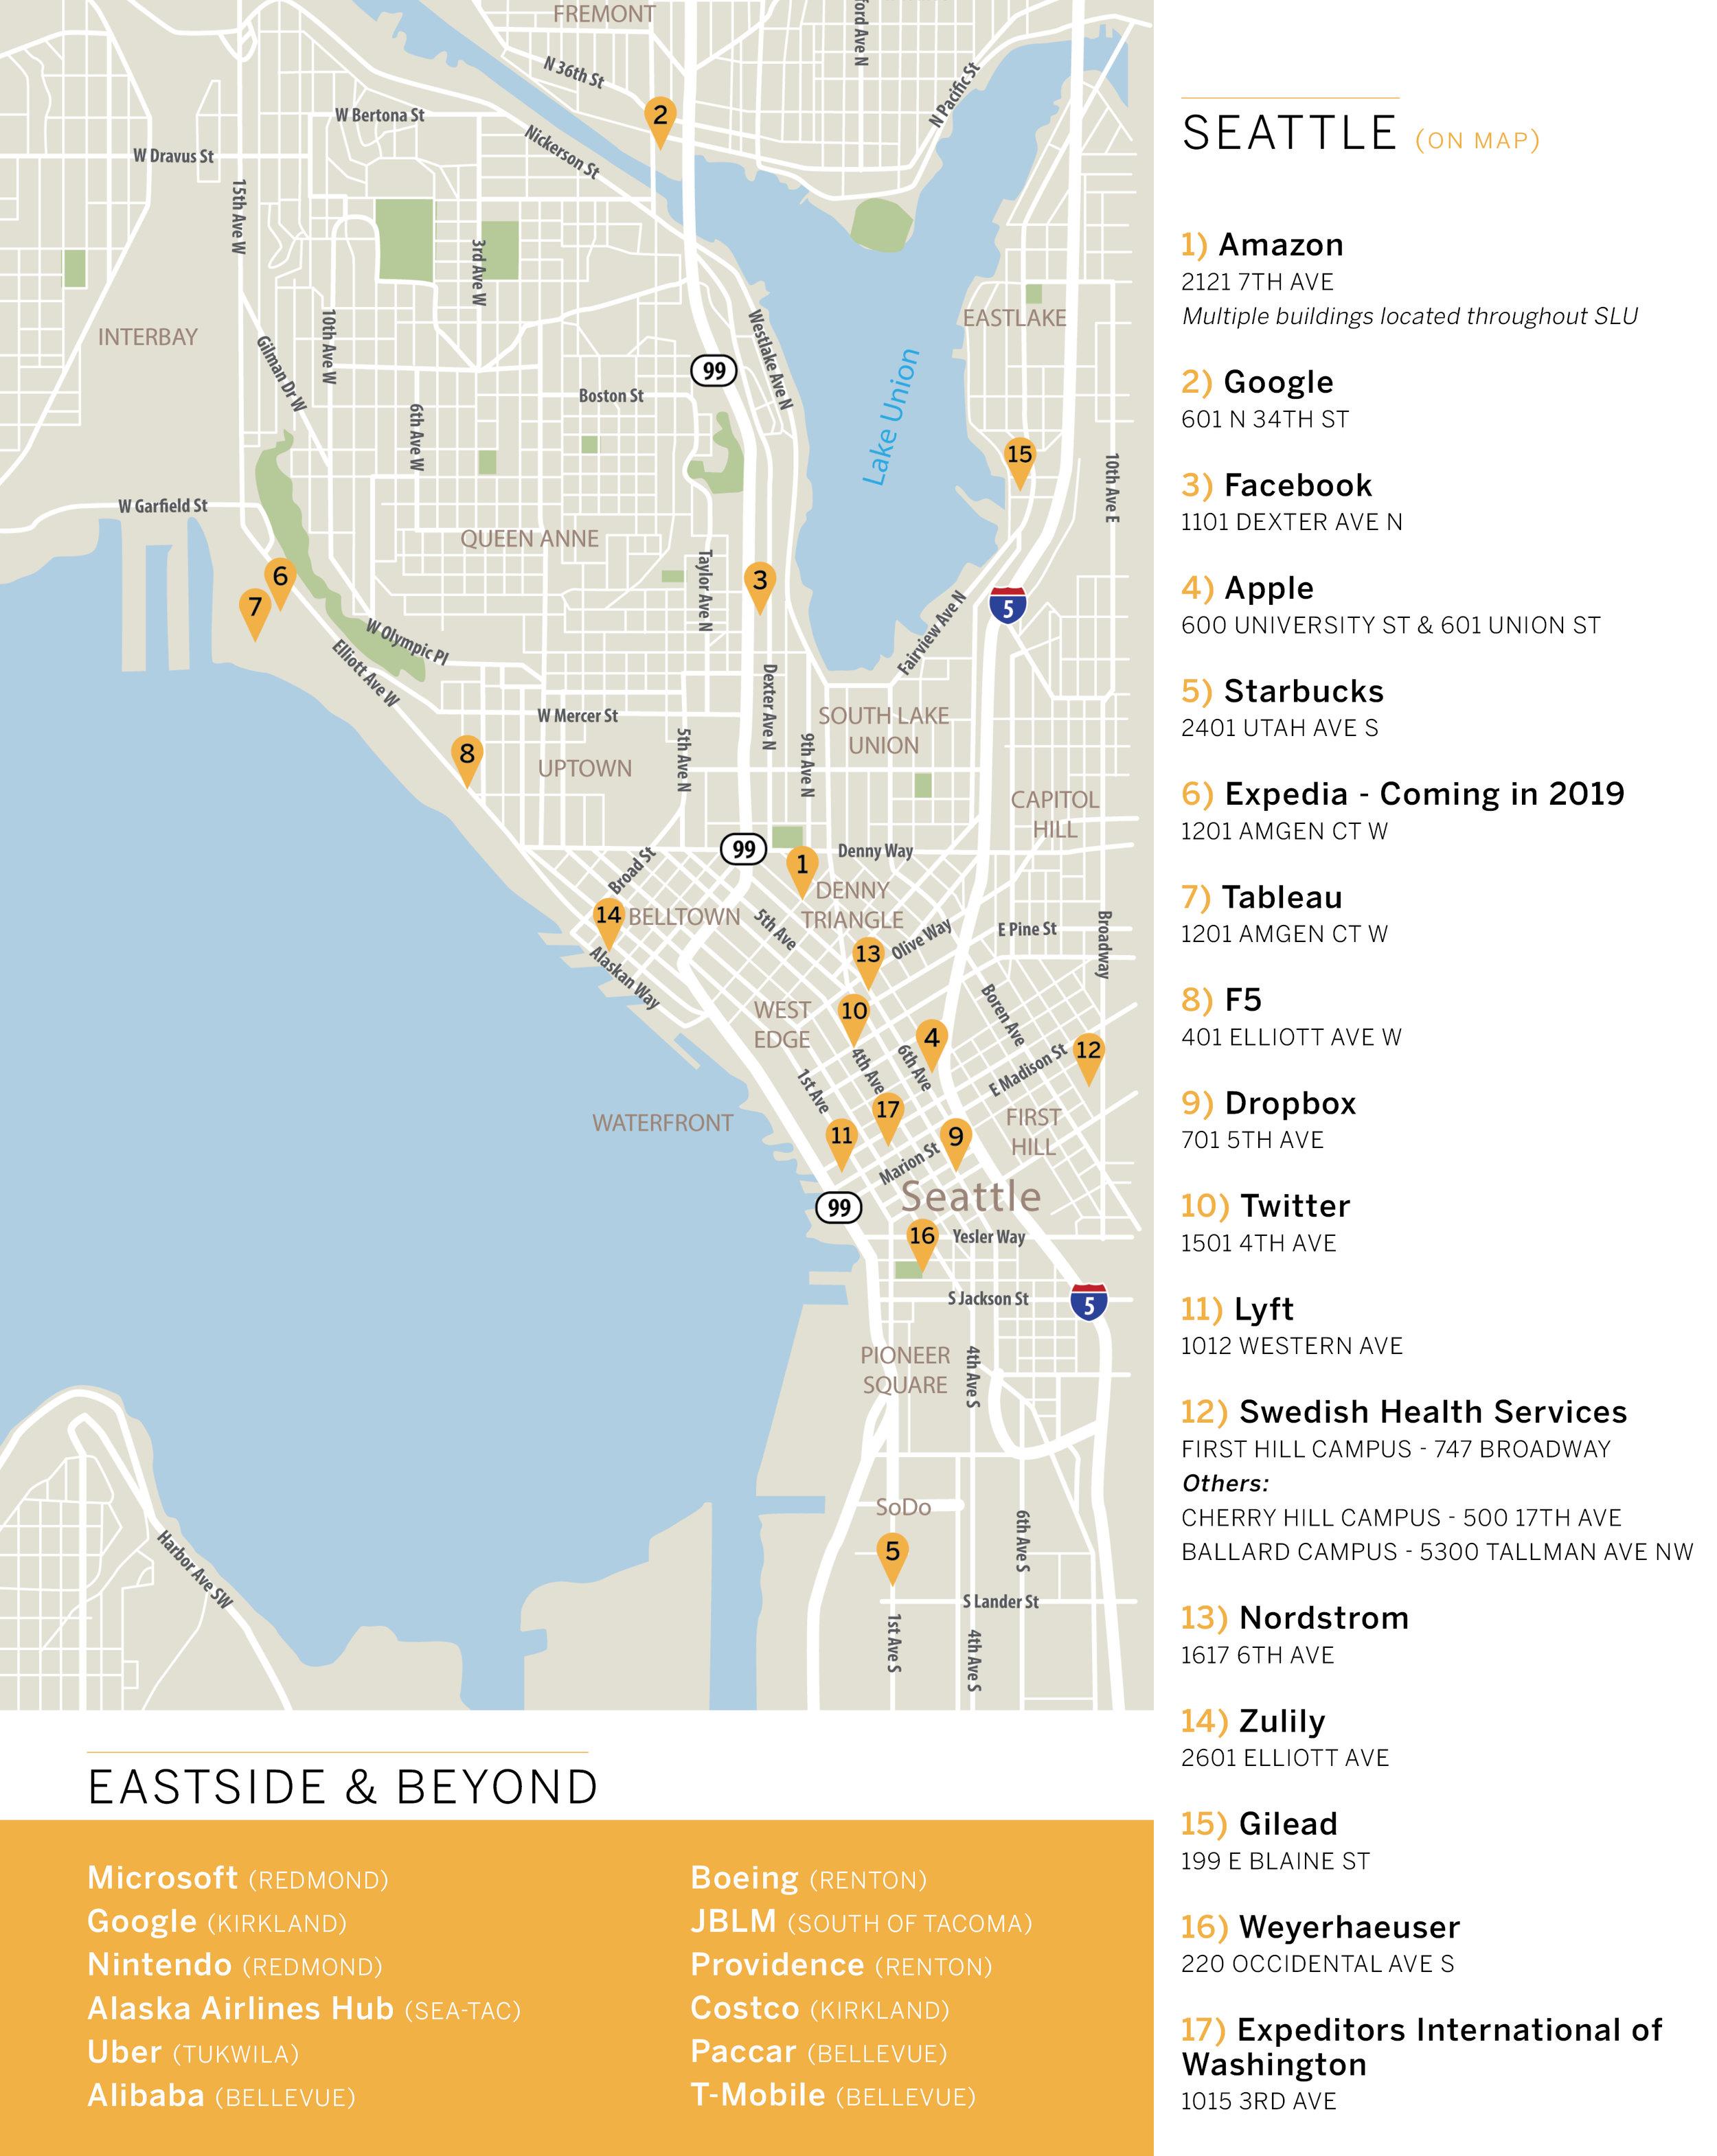 Downtown Seattle Employment Map - Amazon, Google, Facebook, Apple, Starbucks, Expedia, Tableau, F5, Dropbox, Twitter, Lyft, Swedish Medical Services, Nordstrom, Zulily, Gilead, Weyerhaeuser, Expeditors International of Washington